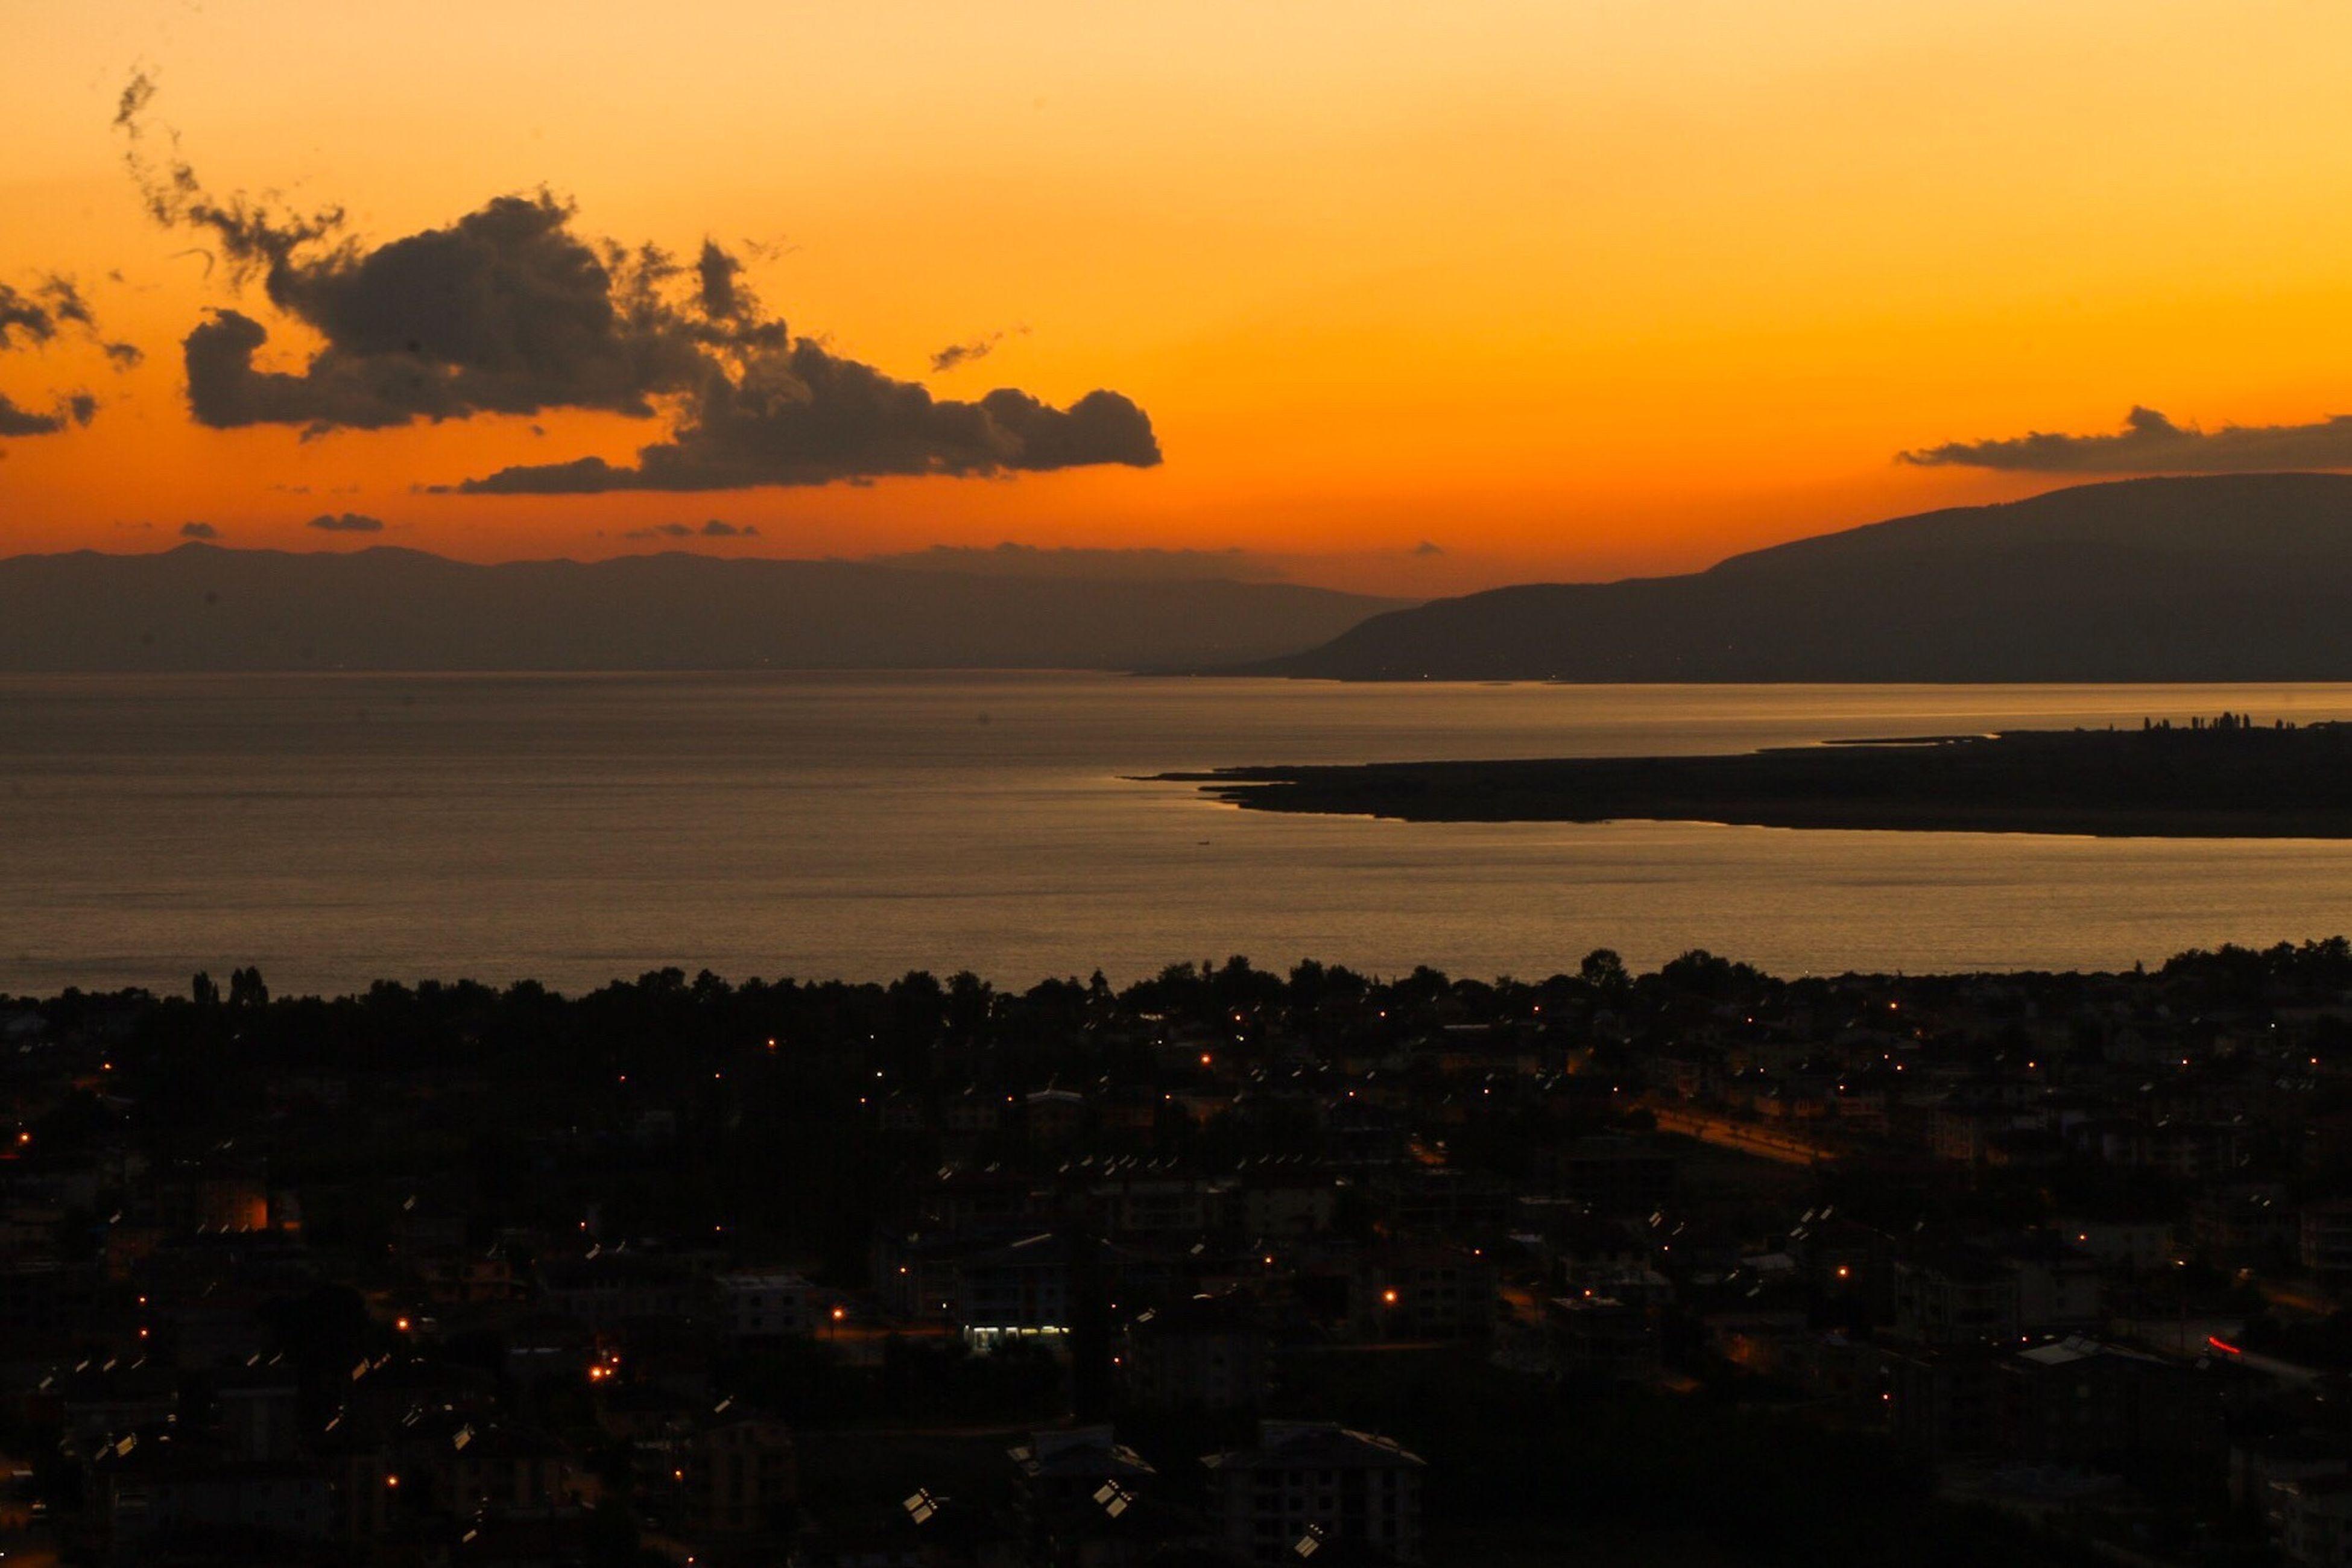 sunset, sea, water, orange color, scenics, mountain, beauty in nature, tranquil scene, sky, tranquility, idyllic, nature, cityscape, city, coastline, outdoors, illuminated, no people, mountain range, ocean, cloud - sky, majestic, remote